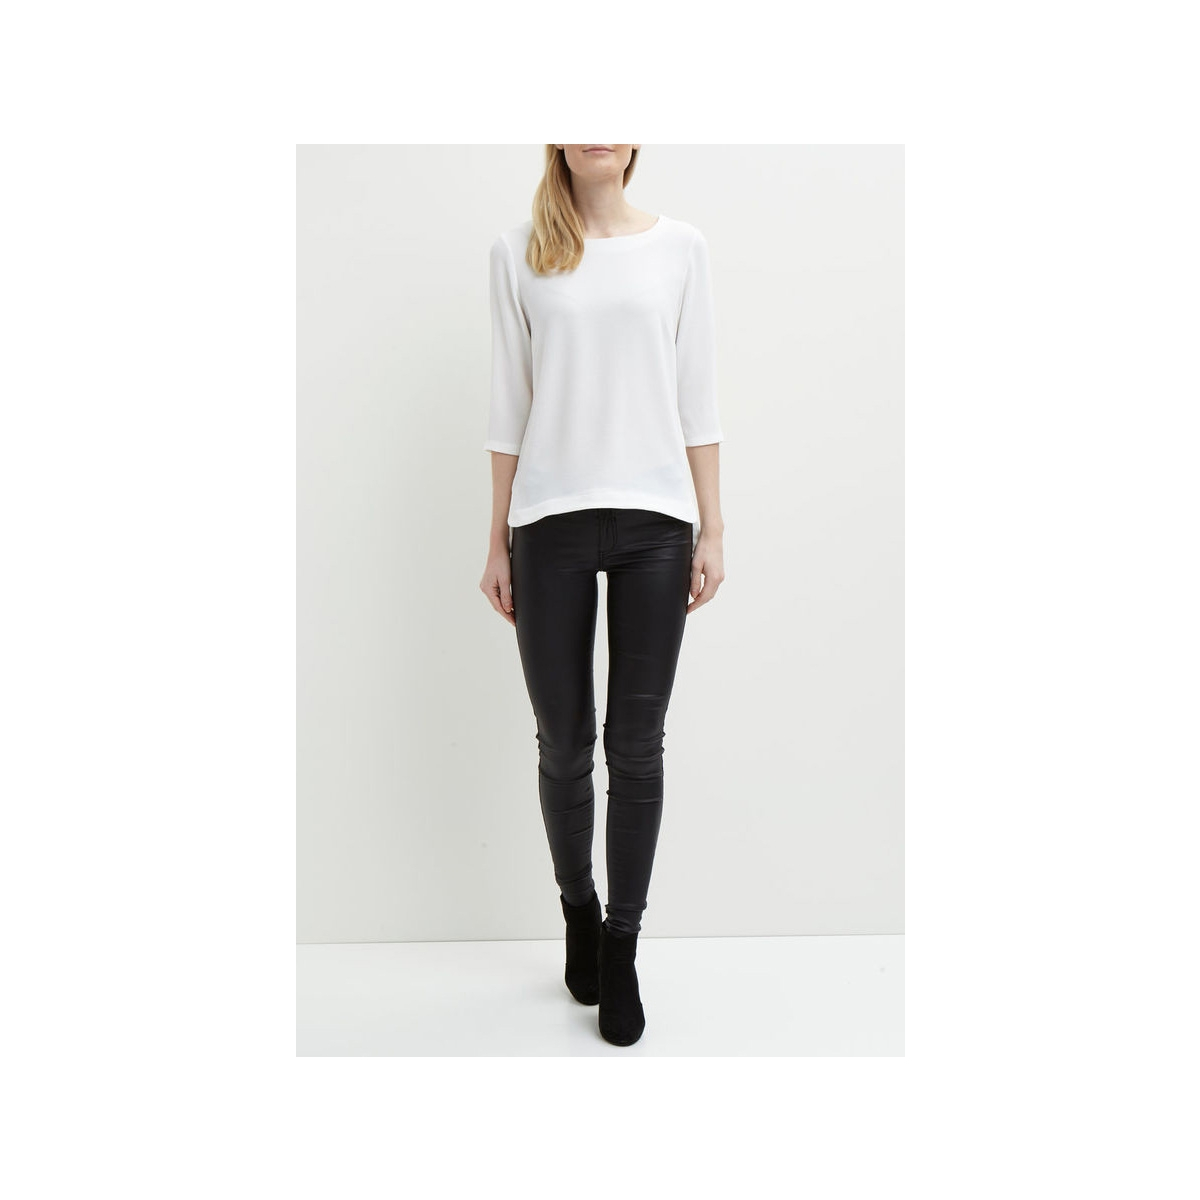 objcorlee 3/4 top noos 23024282 object t-shirt gardenia